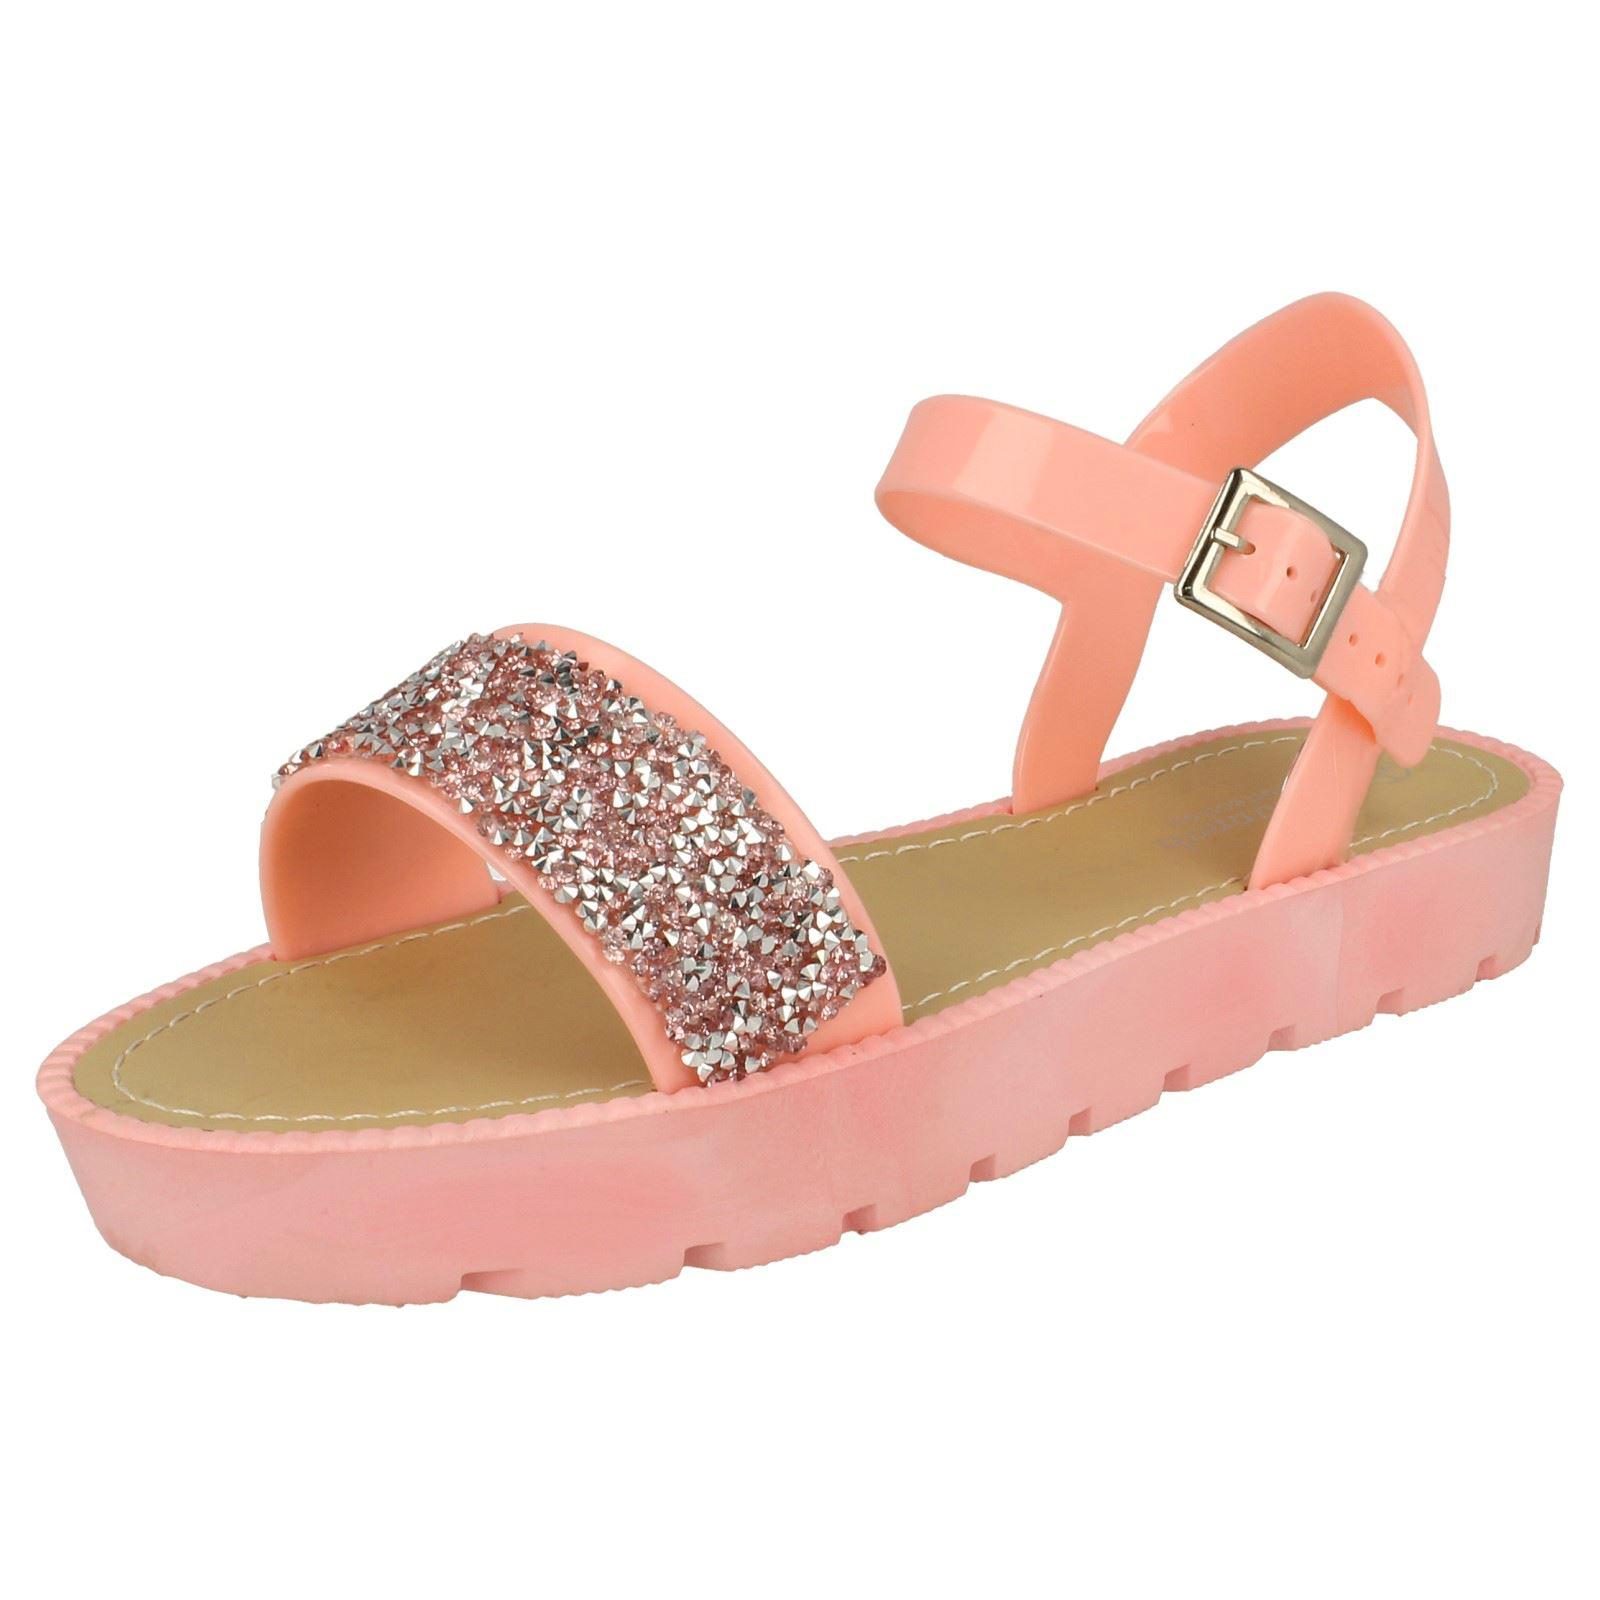 57443bab7dd Savannah Ladies Glitter Flatform Sandals Pink UK 5 Standard